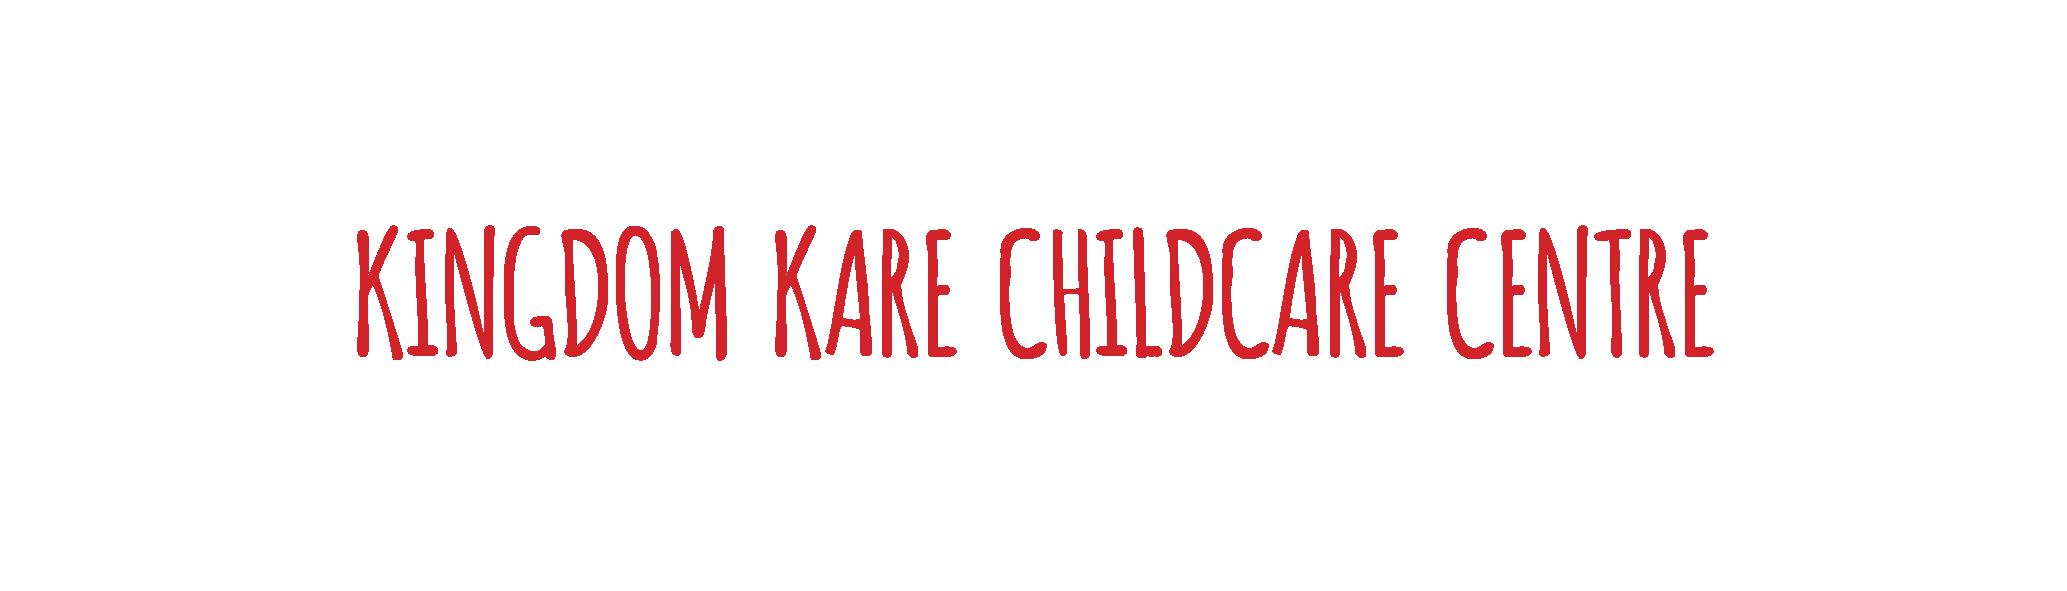 Kingdom-Kare-Childcare-Centre-Rotating-Header5.png